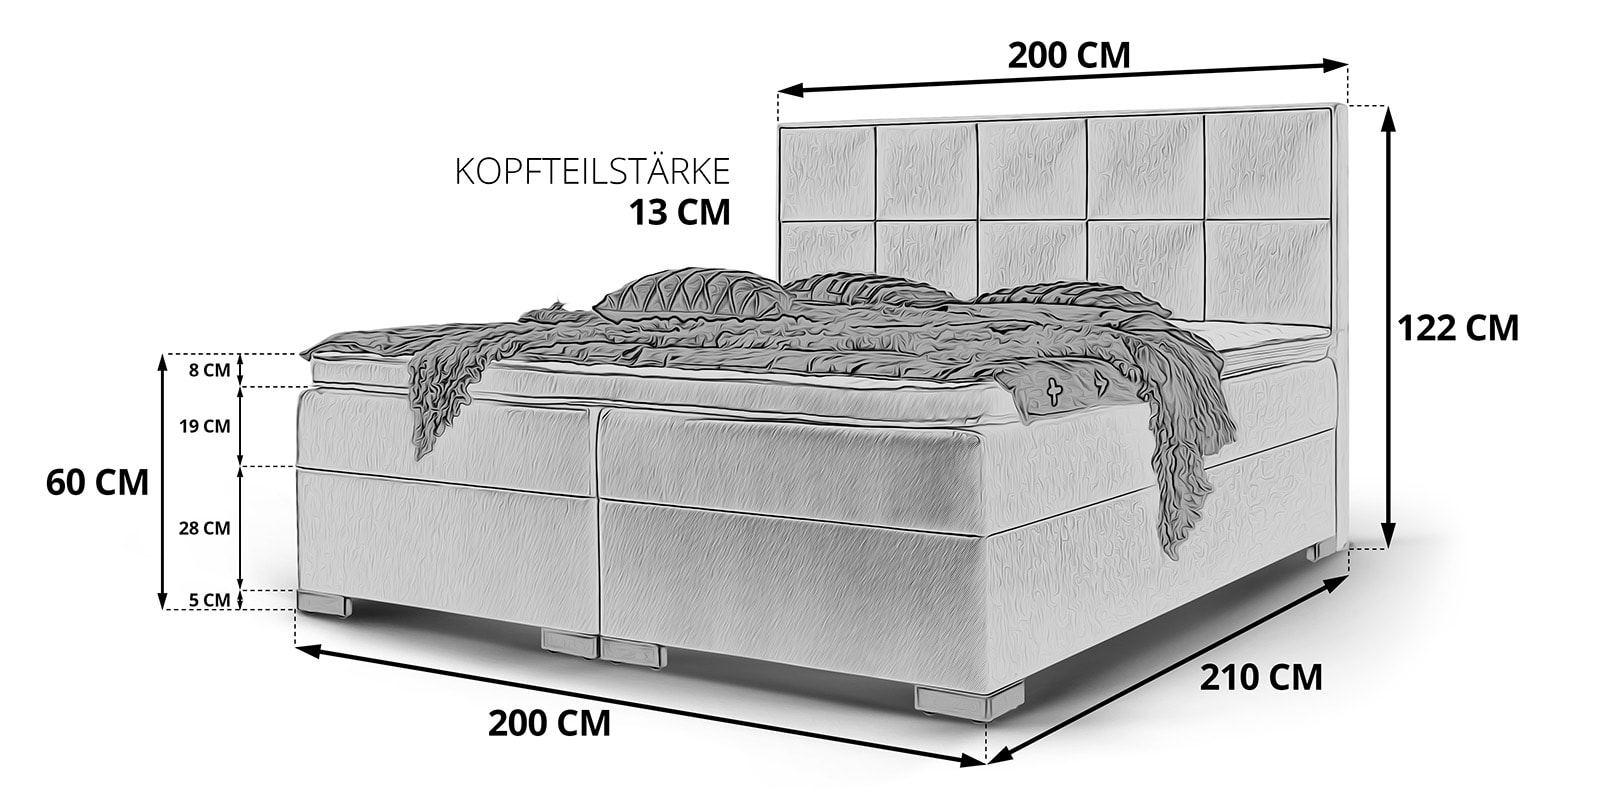 Full Size of Boxspringbett Mit Bettkasten Stauraum Bett Arizona Skizze 200x200 Weiß Betten Komforthöhe Wohnzimmer Stauraumbett 200x200